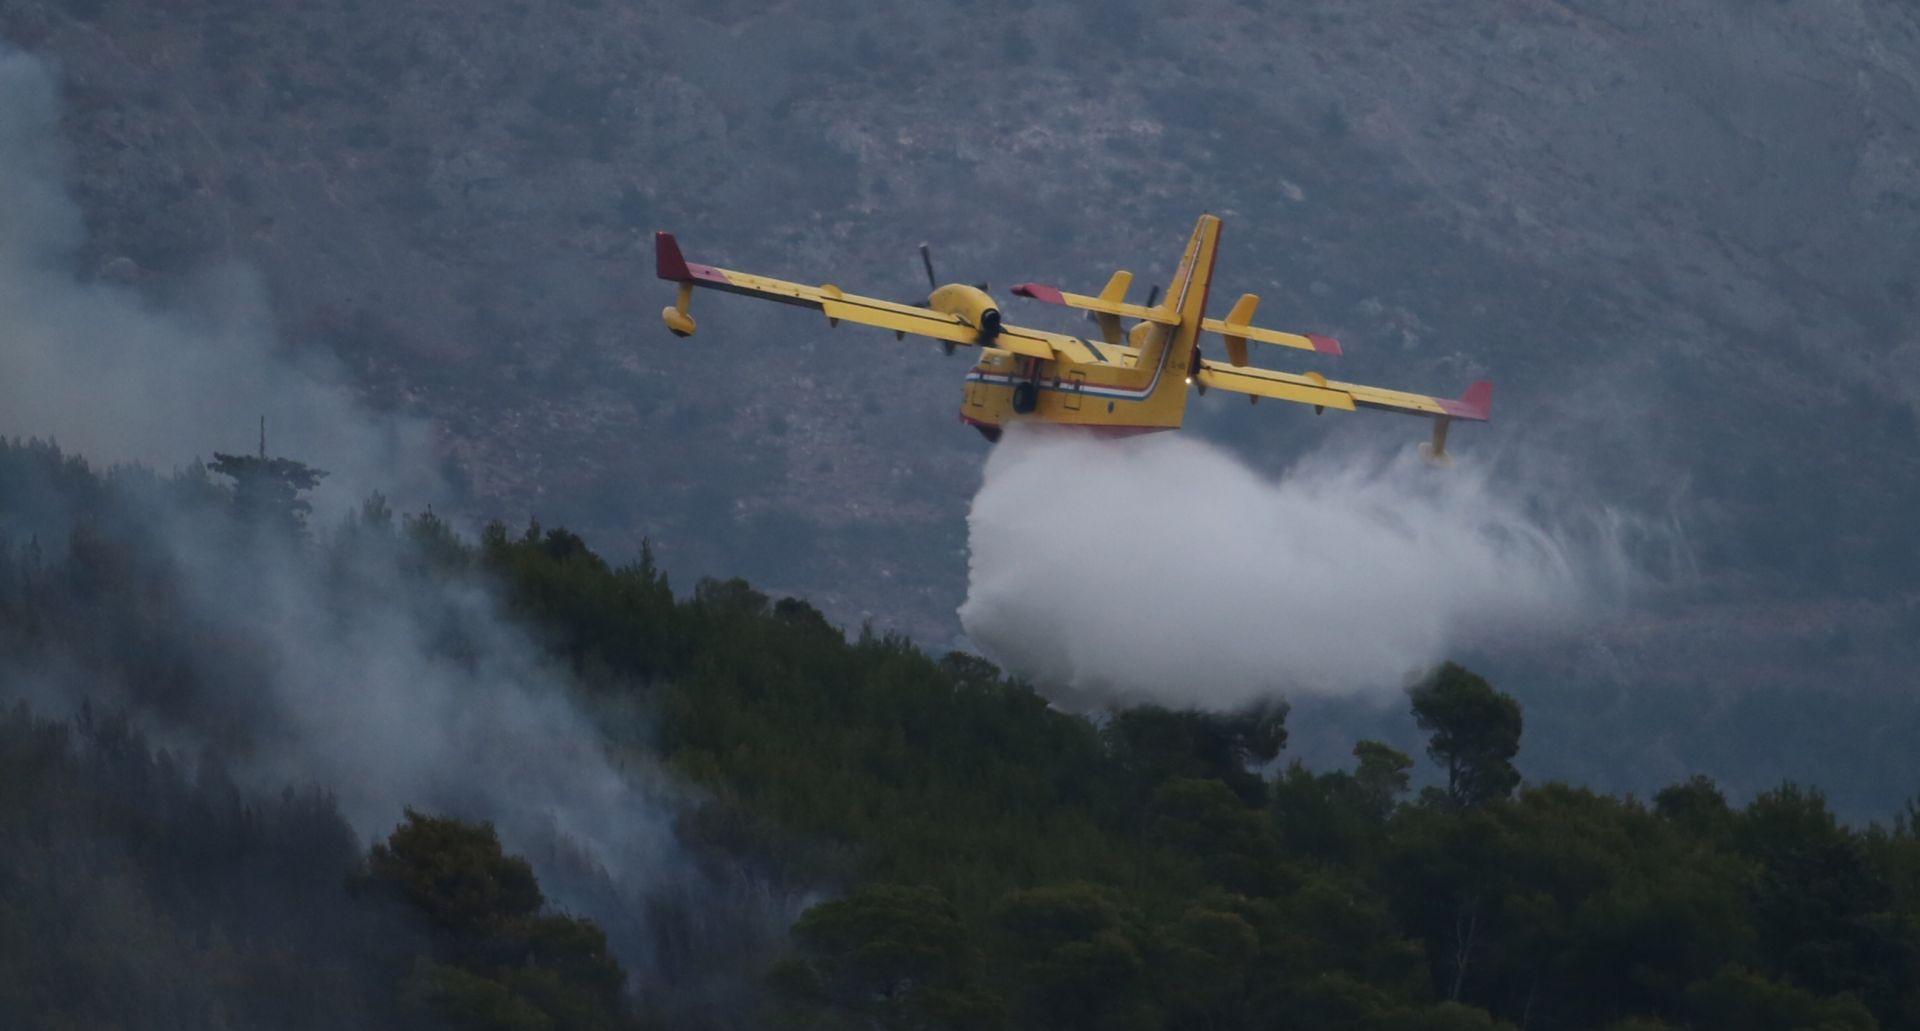 Požar u Žrnovnici se smanjio, cjelu noć dežurat će 60-ak vatrogasaca